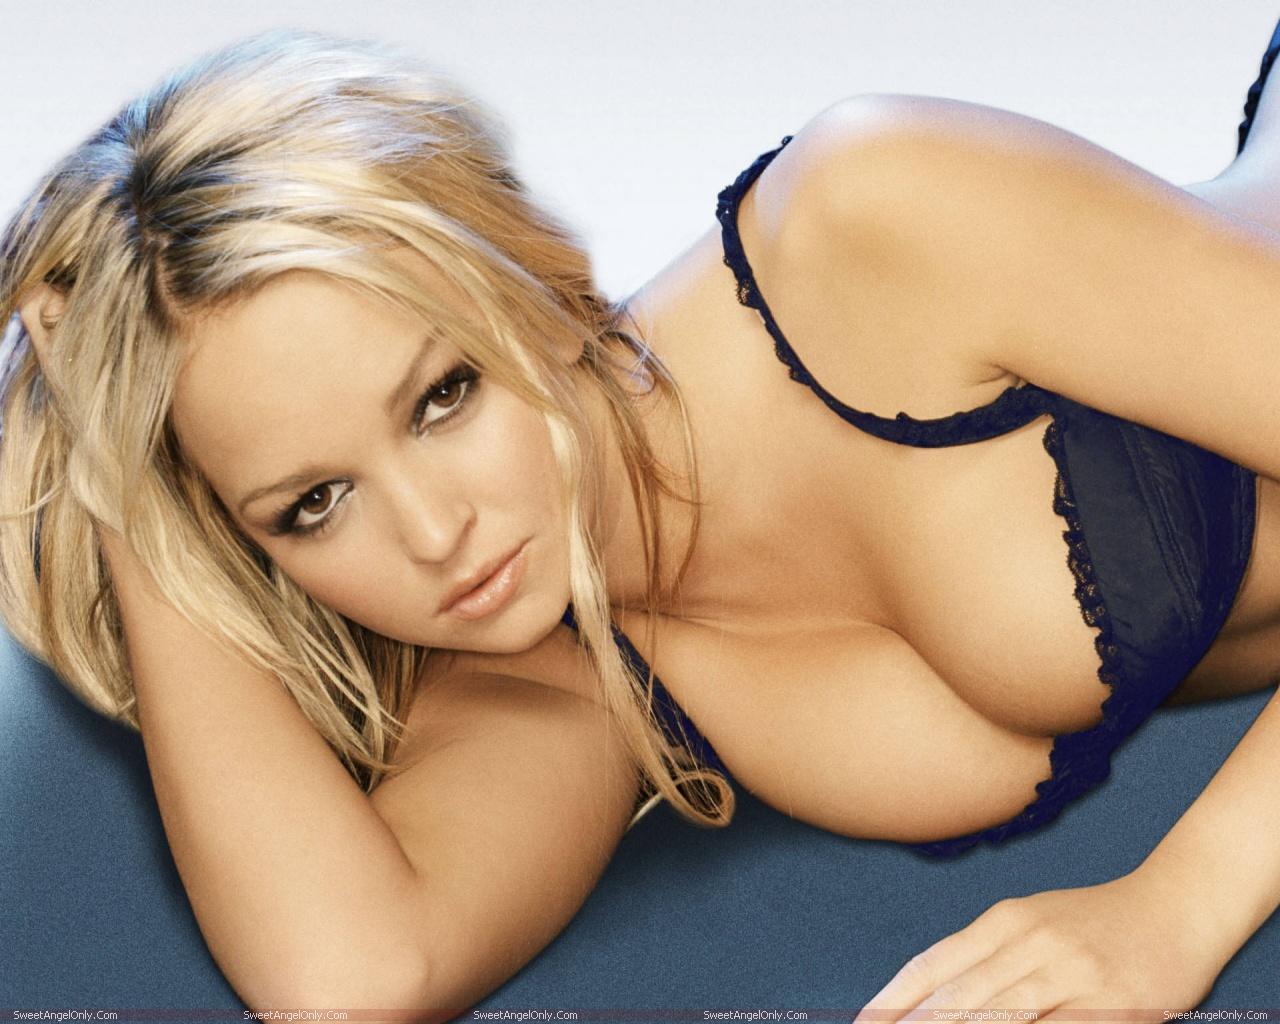 Very Jennifer ellison sexy